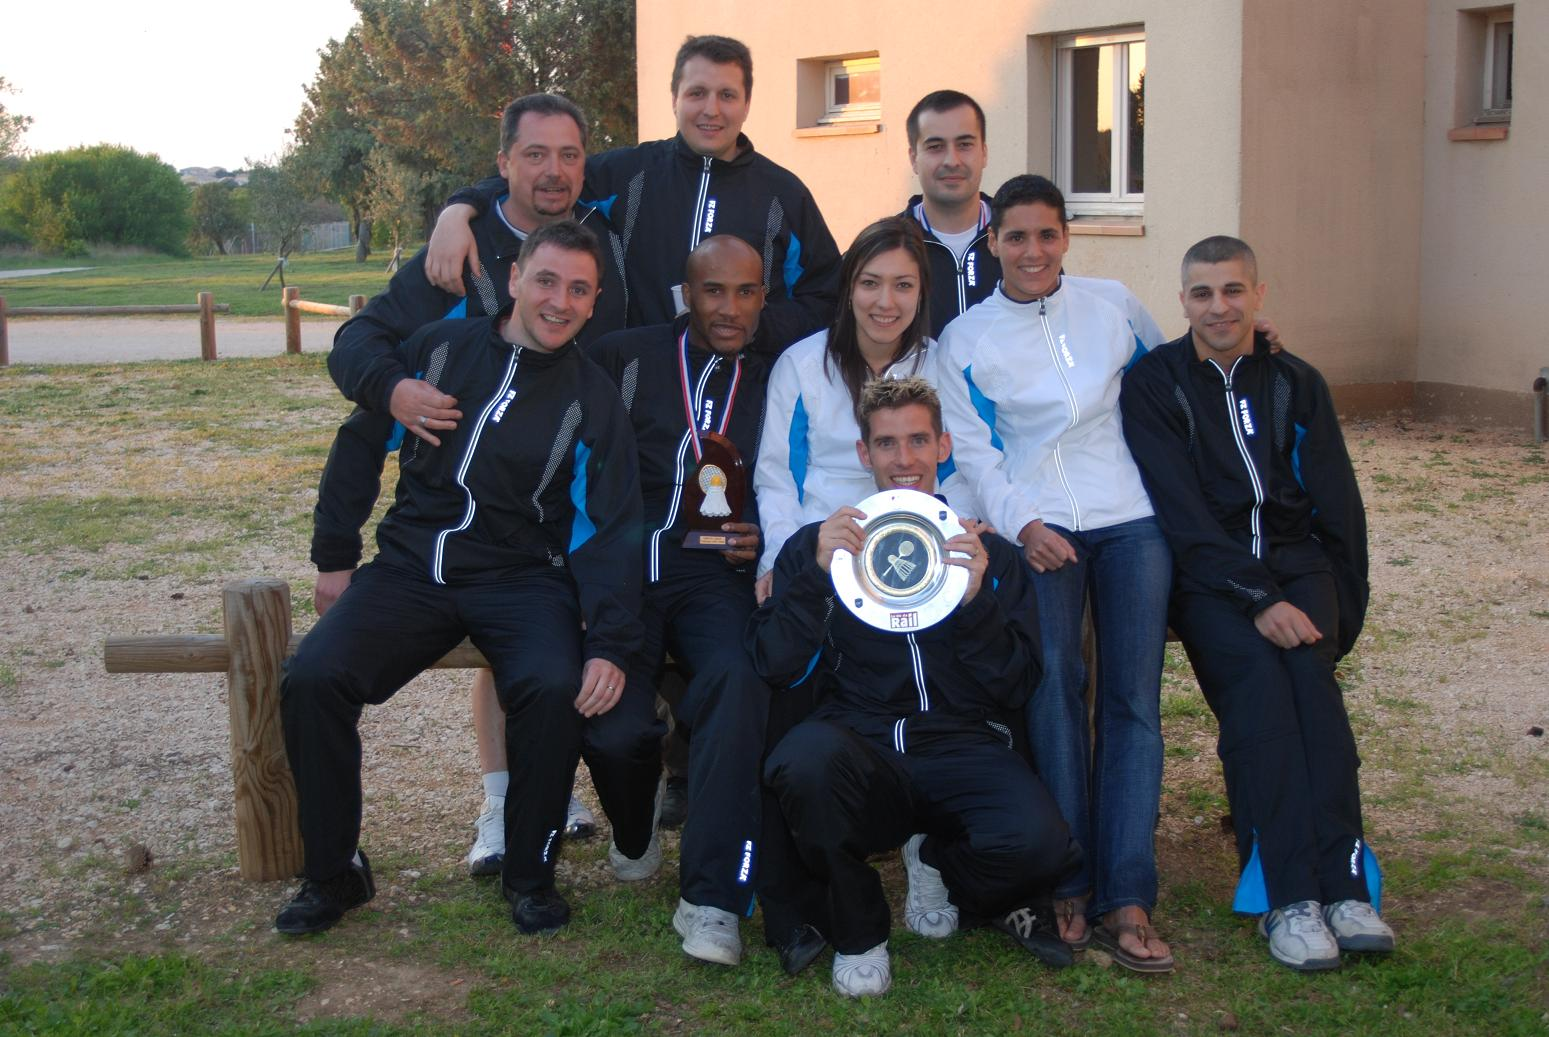 Champion de france cheminot 2009